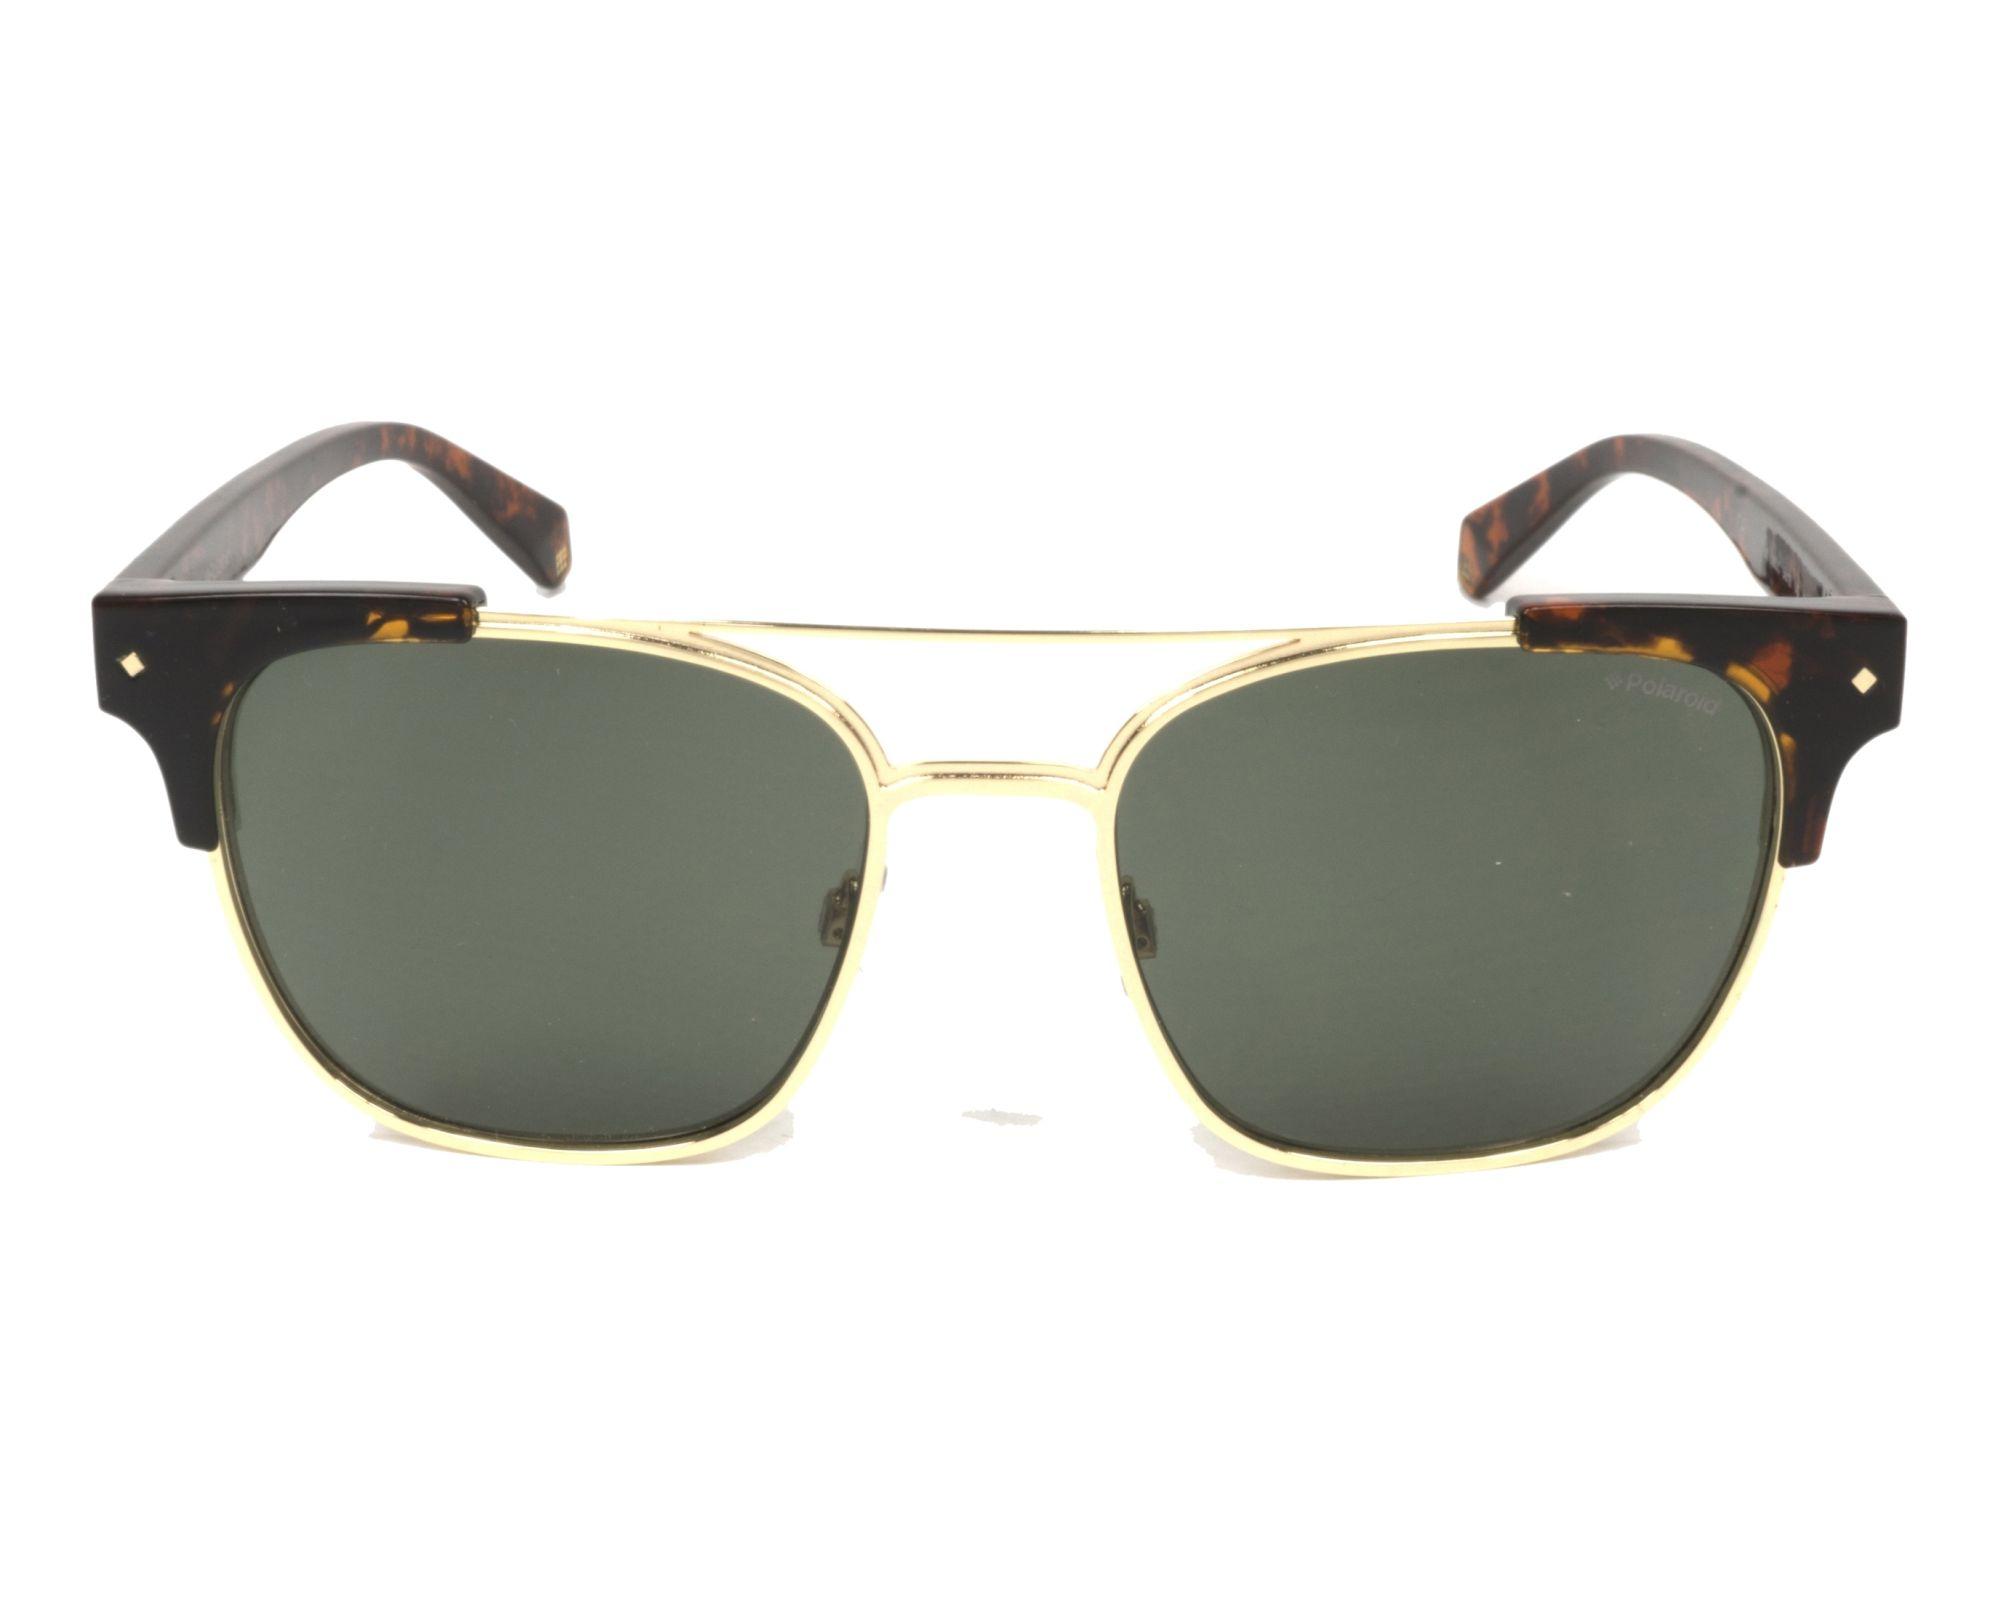 Sunglasses Polaroid PLD-6039-S-X 086 UC 54-18 Havana Gold front d03ff0f5ee